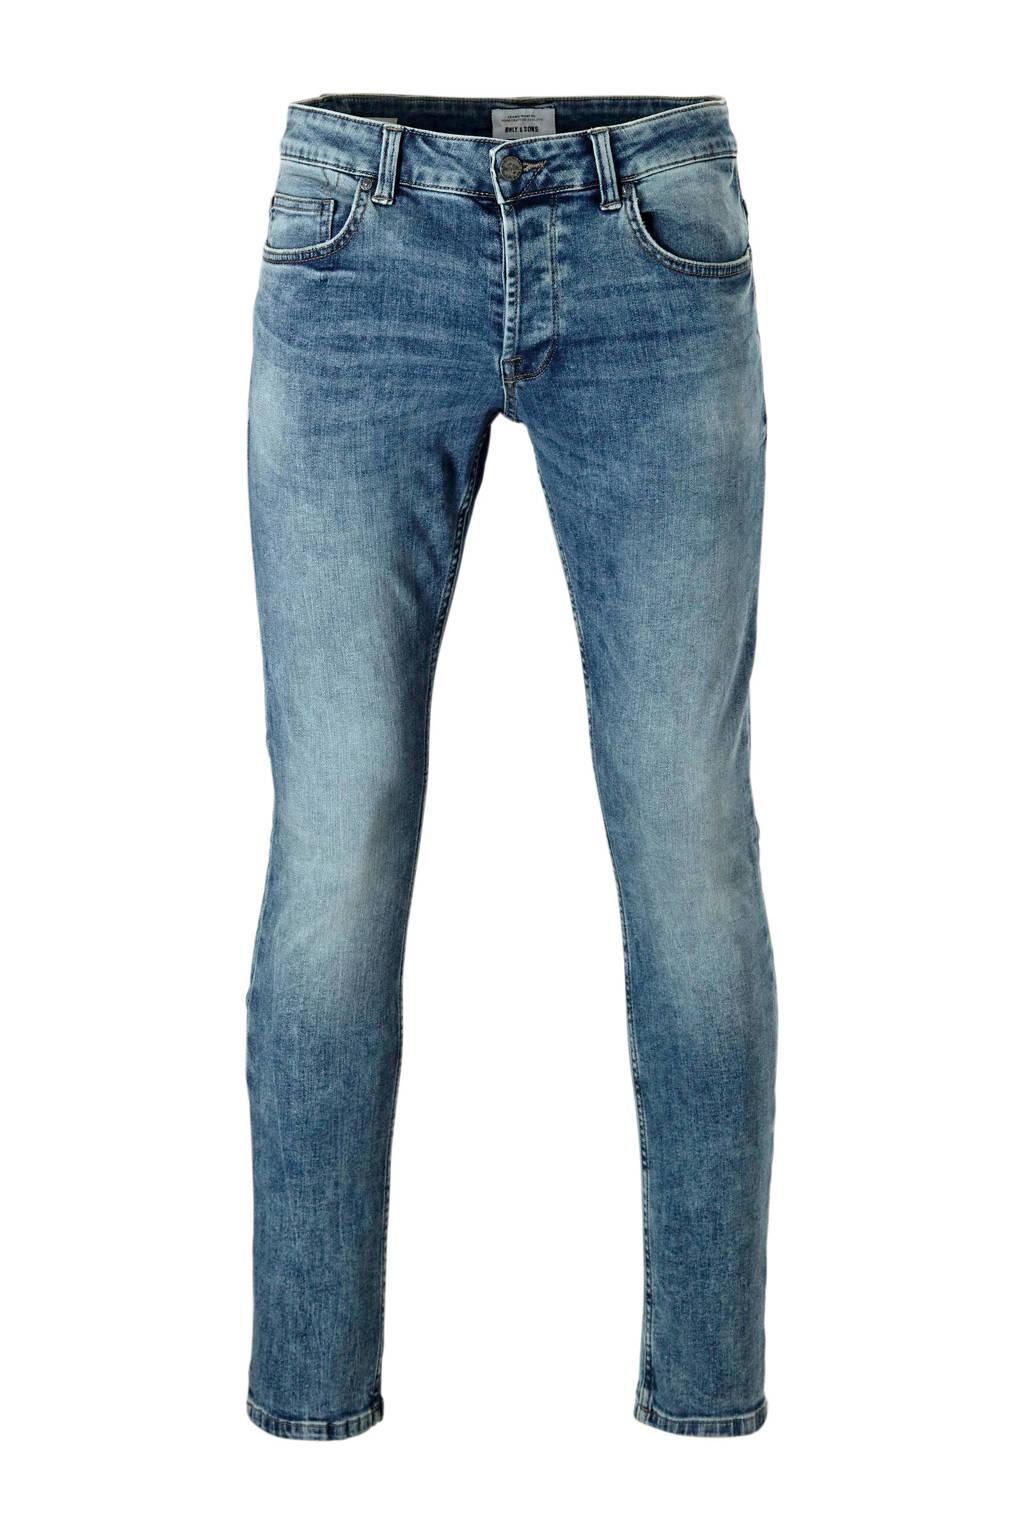 Only & Sons jeans, Light denim